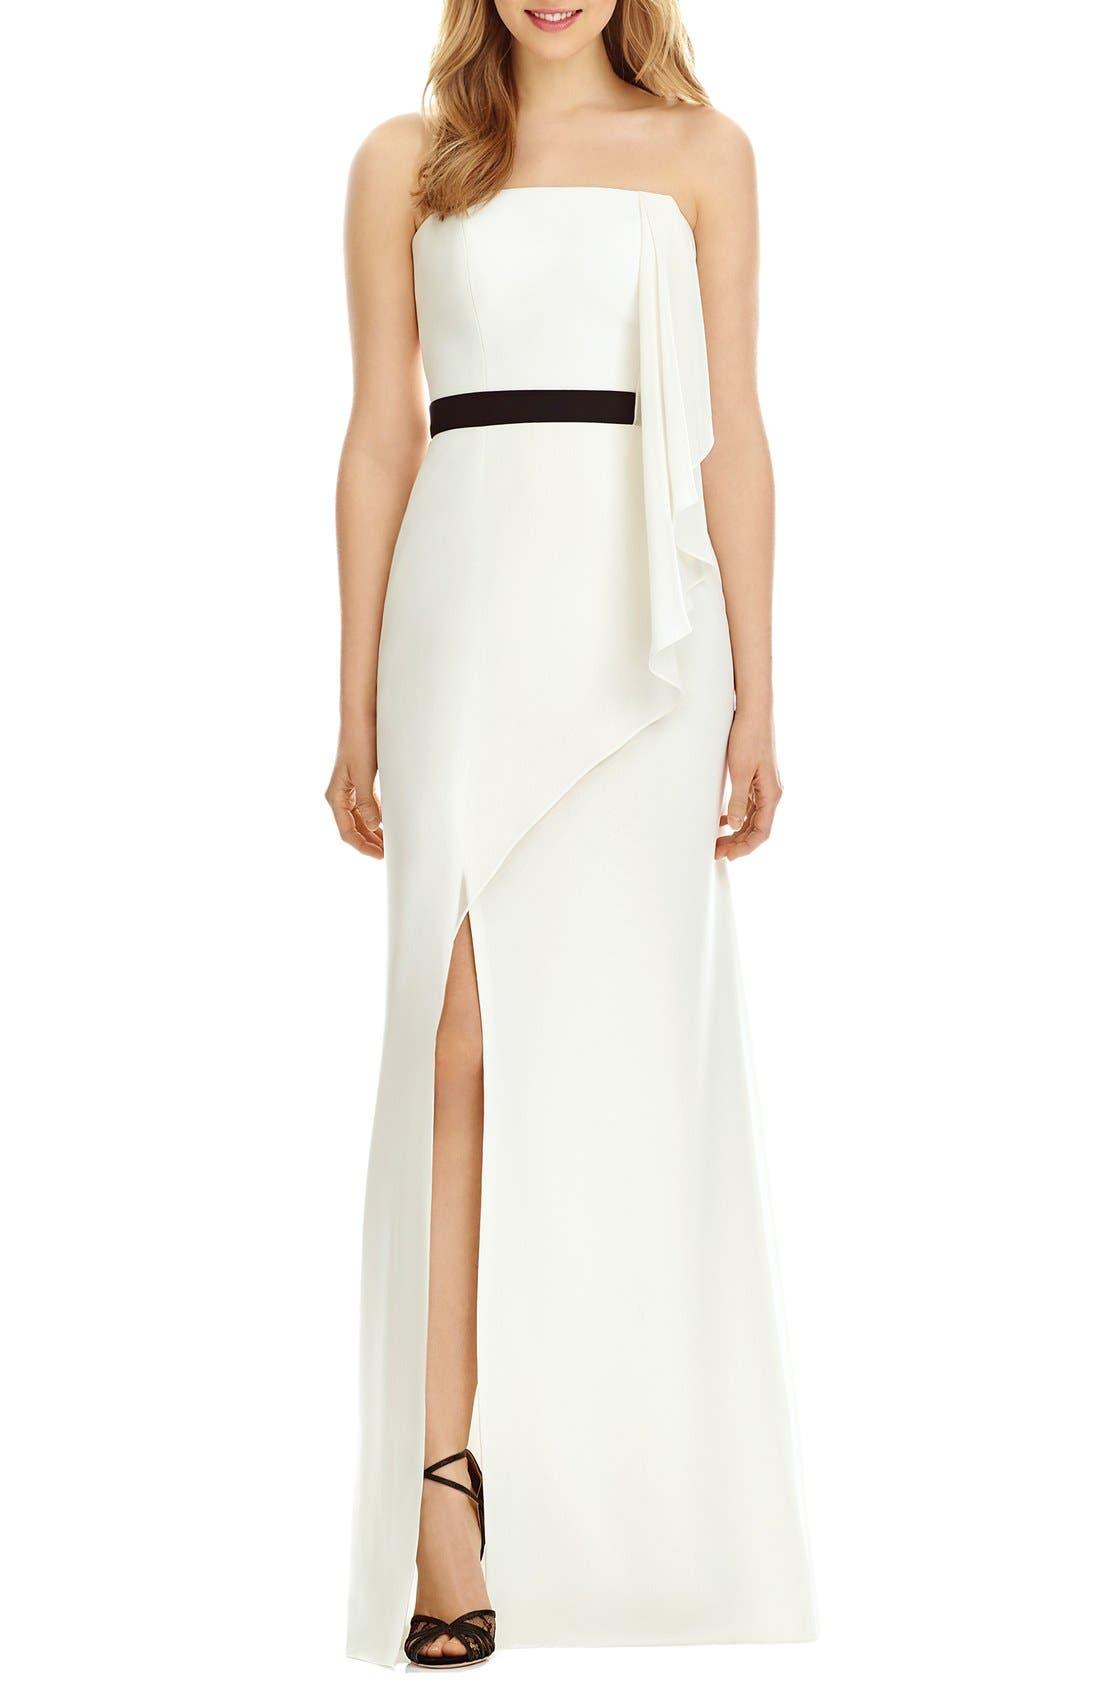 SOCIAL BRIDESMAIDS Strapless Georgette Drape Front Maxi Dress